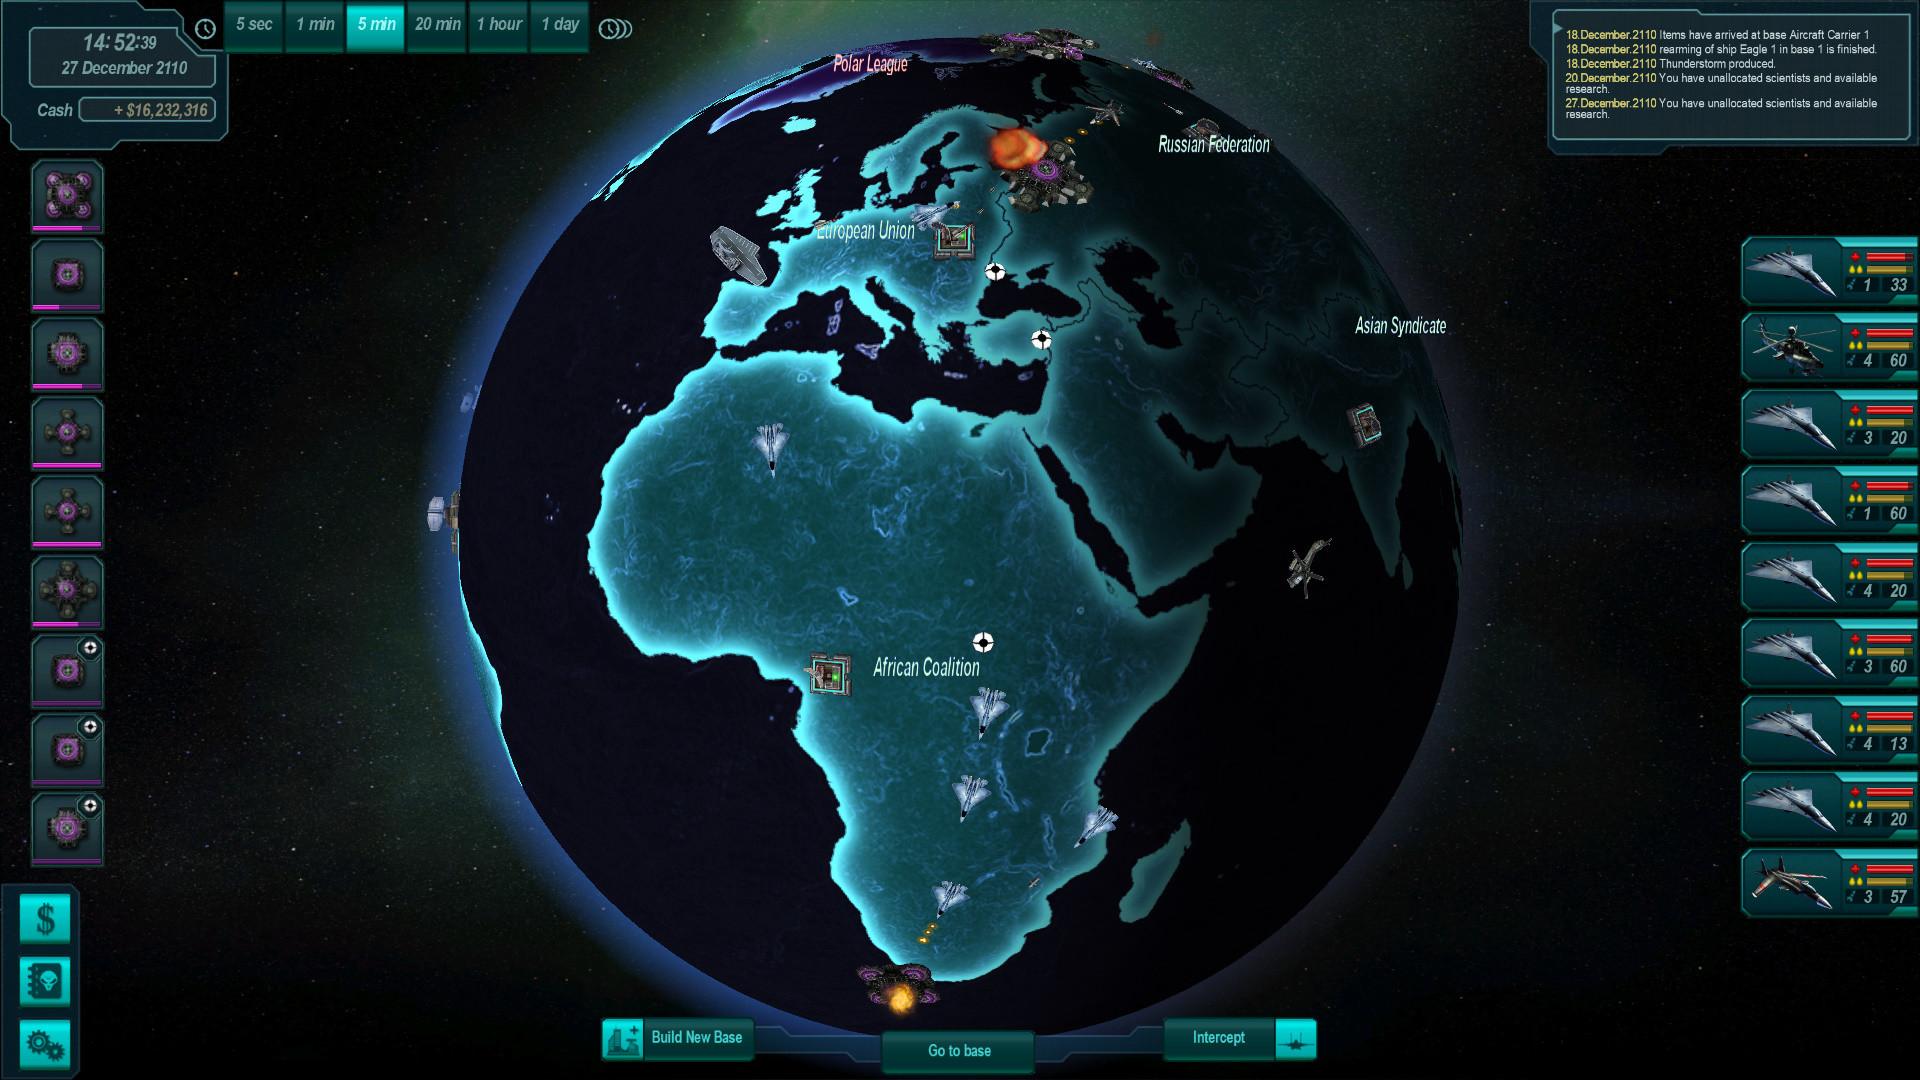 ufo2-extraterrestrials-pc-screenshot-1